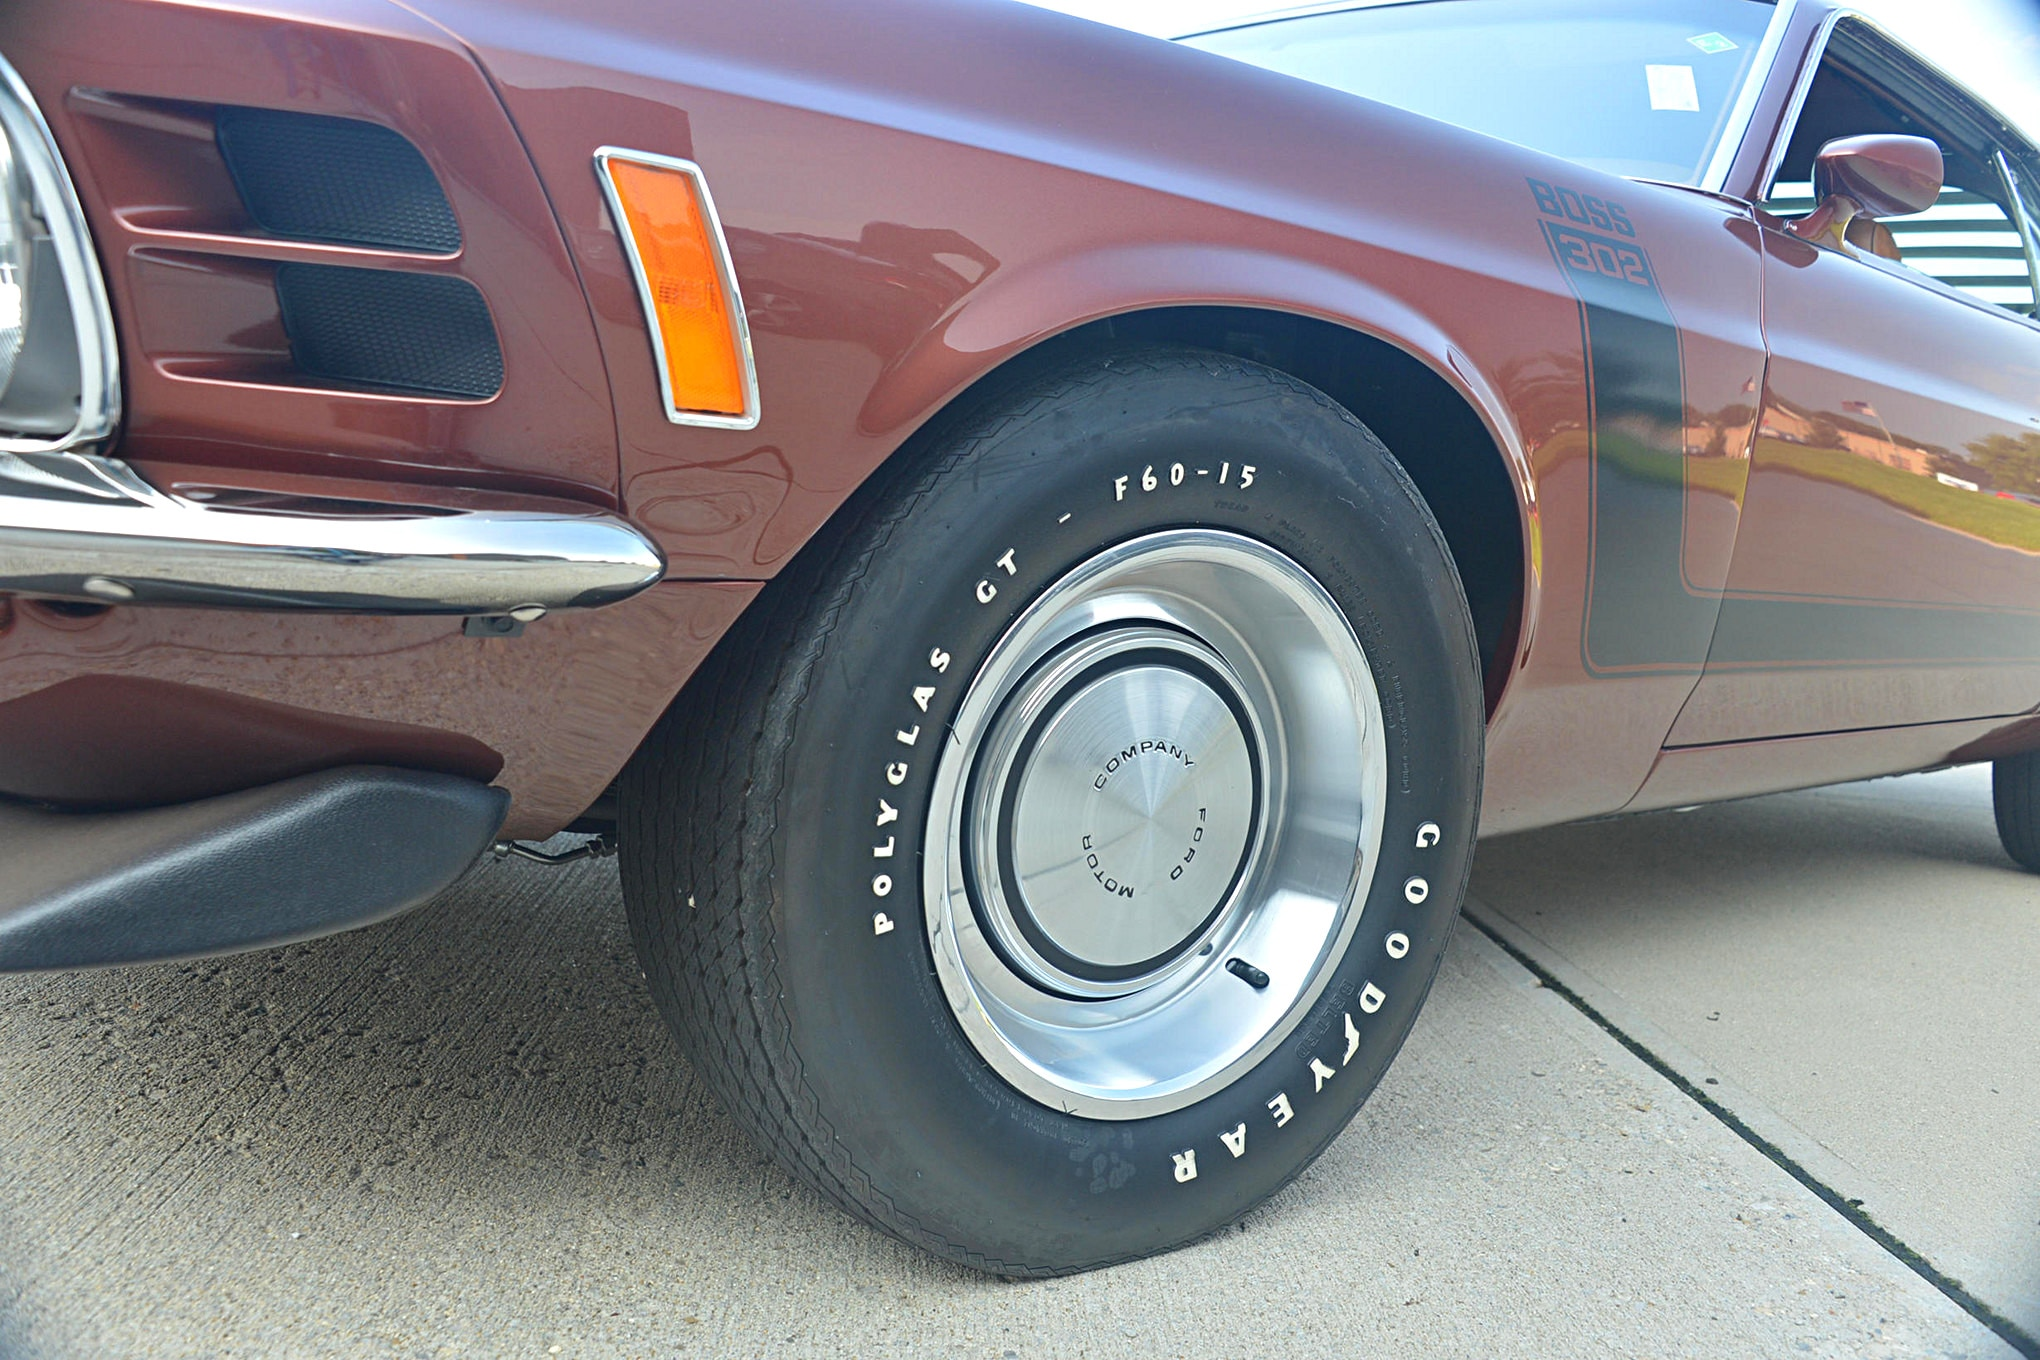 002 1970 Boss302 Chesnut Heasley